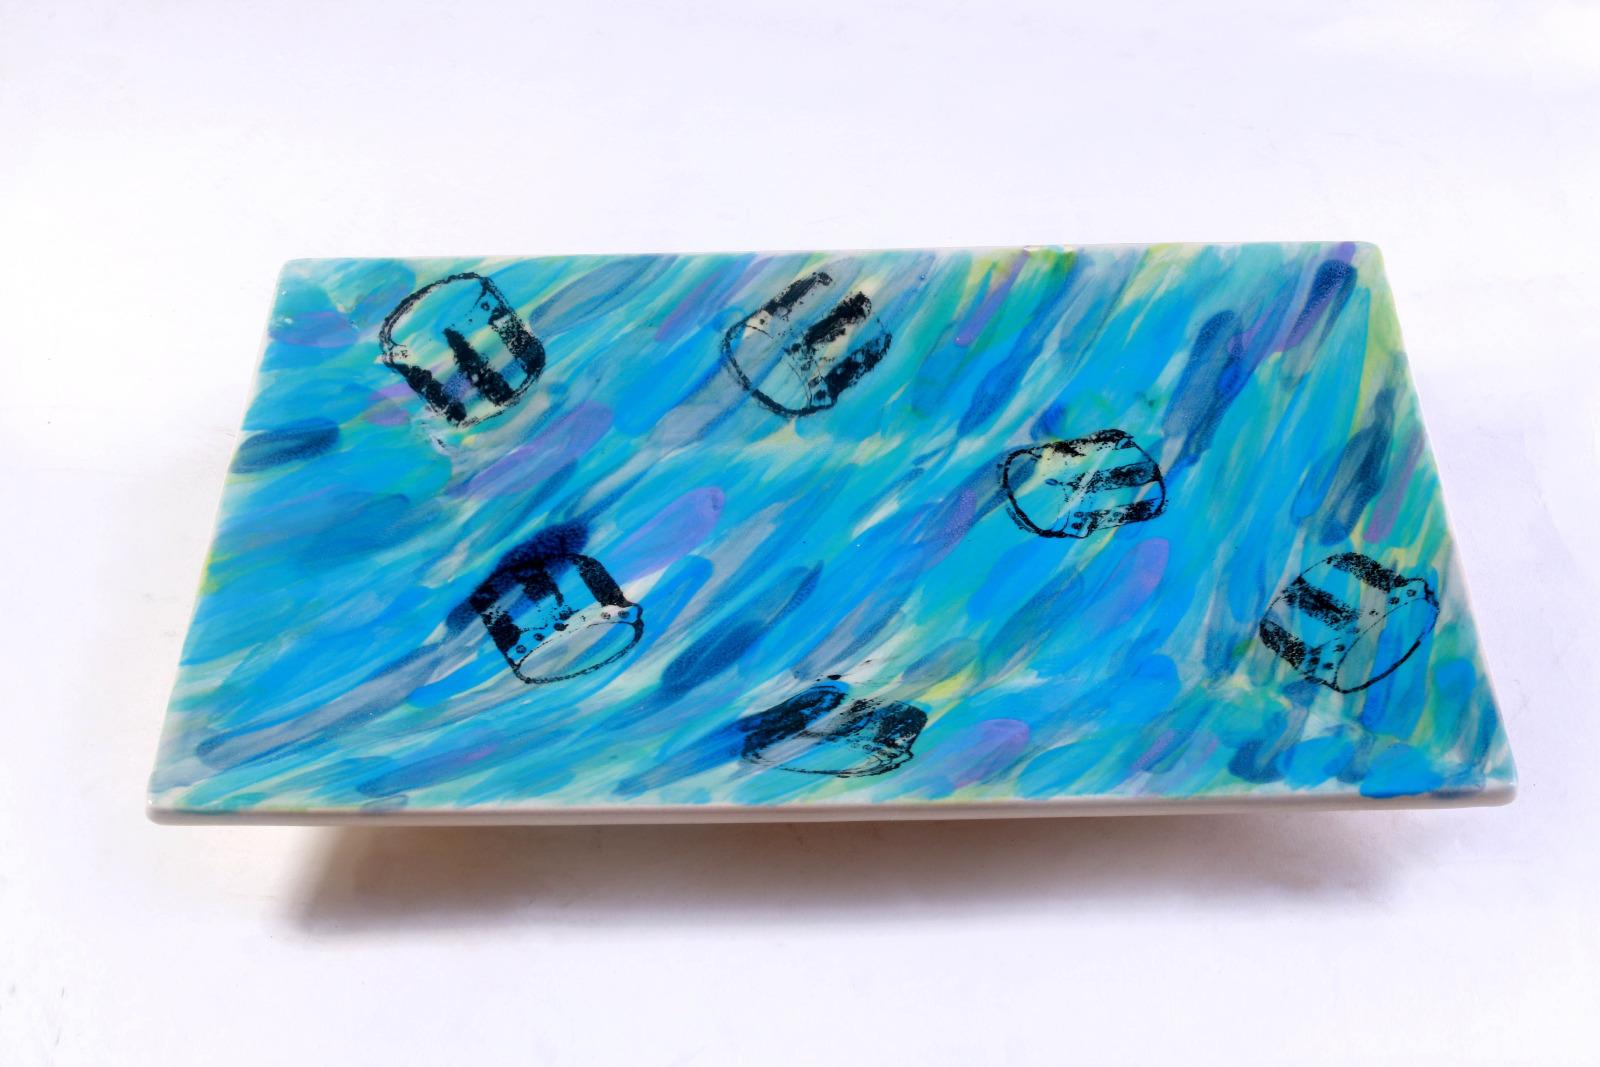 Hand-made Junkanoo Platters